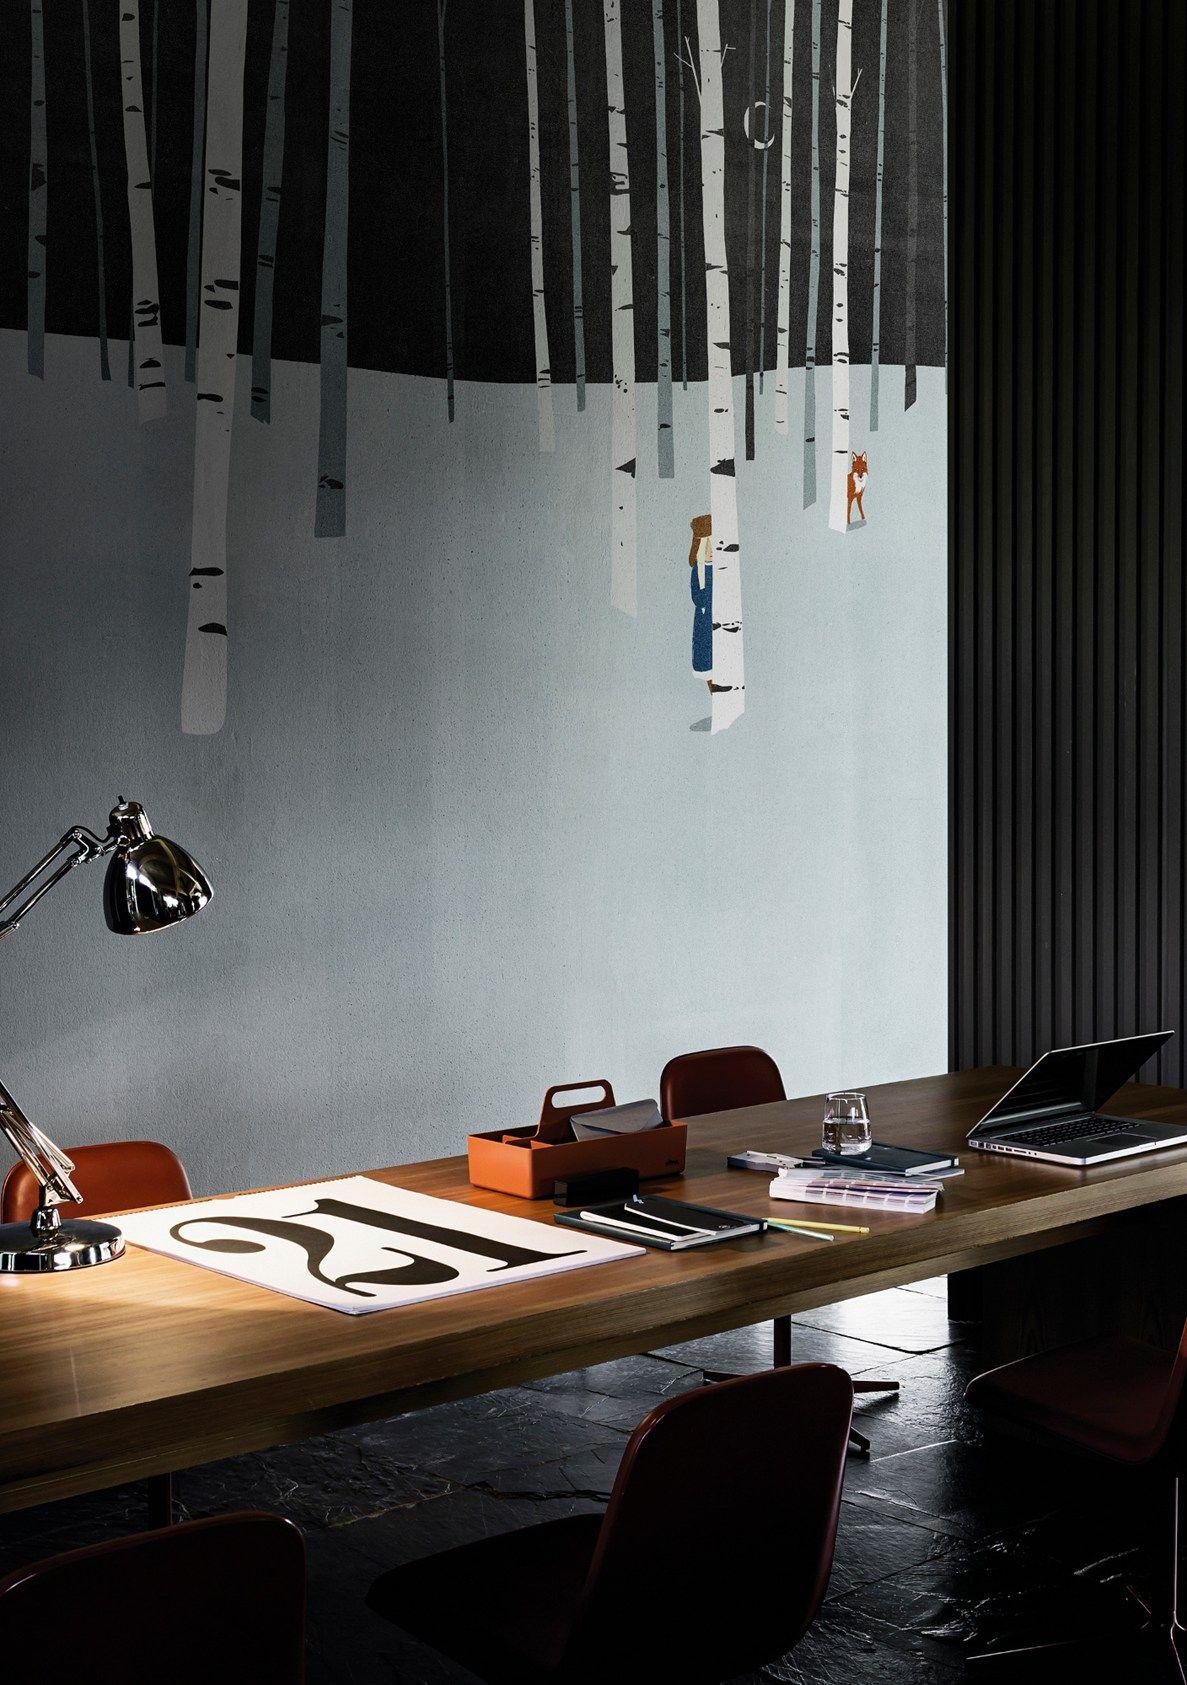 Trendoffice: Art Deco style - again